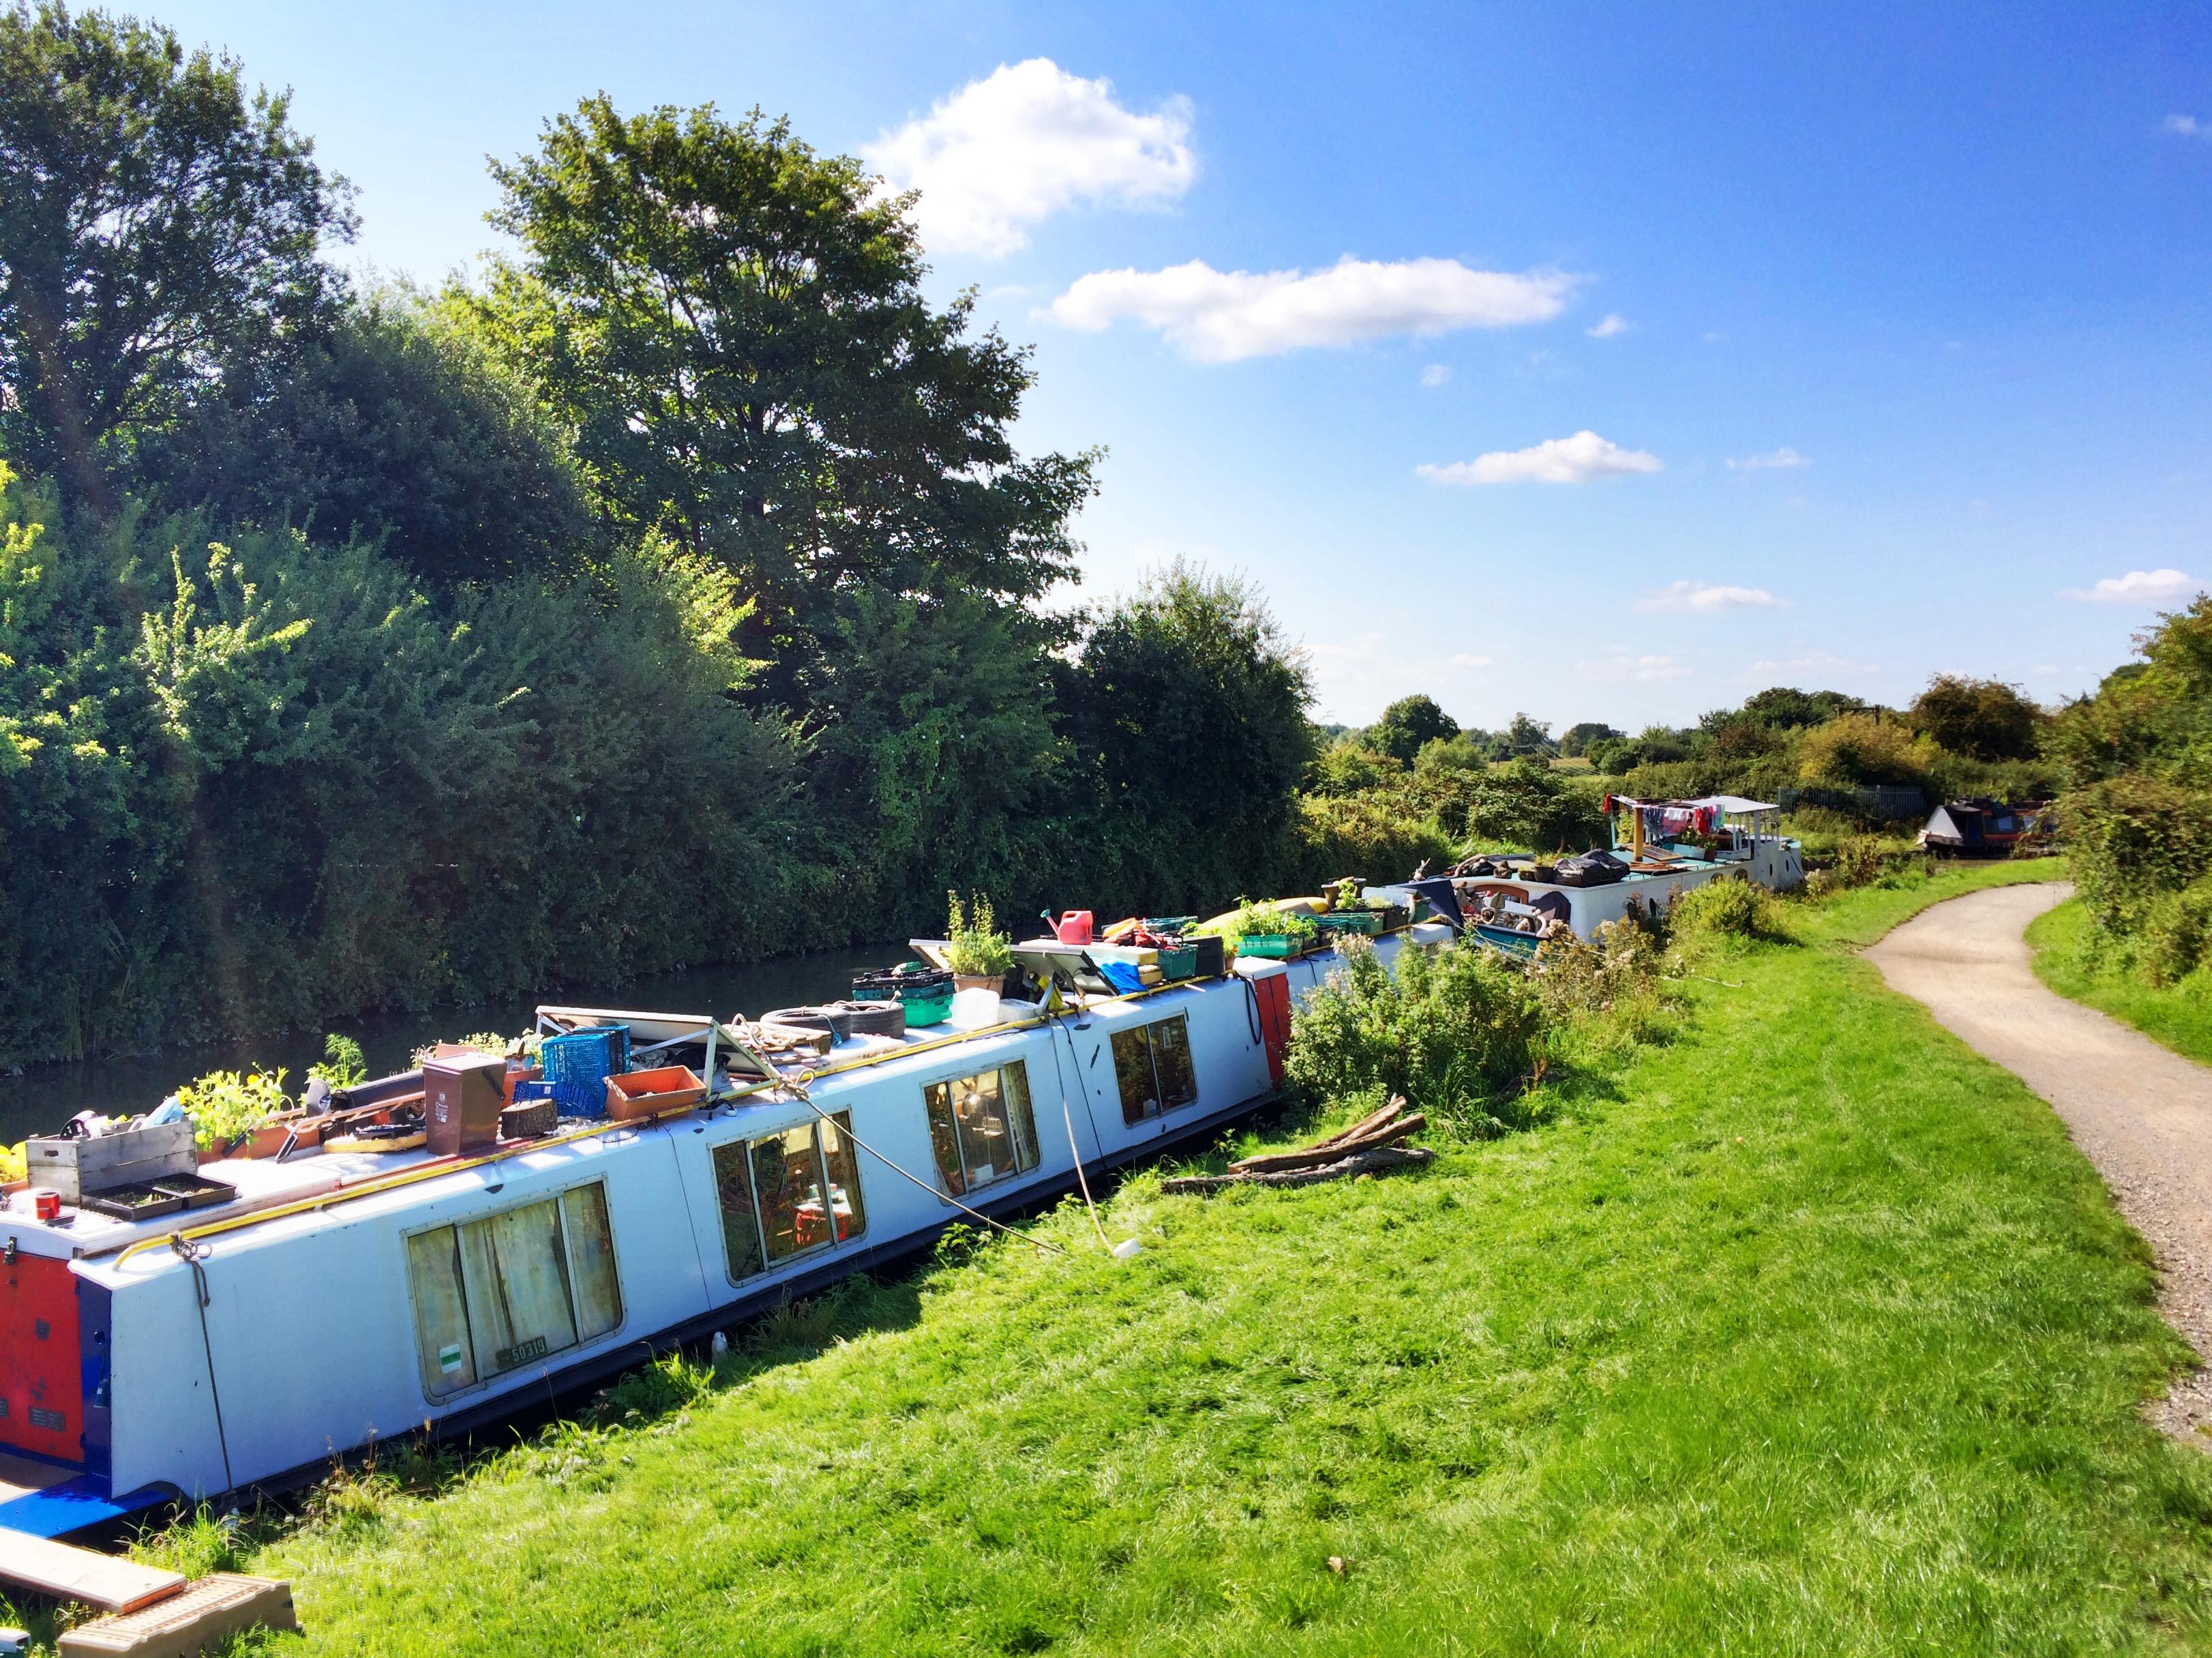 Kennet & Avon Canal, Wiltshire, UK